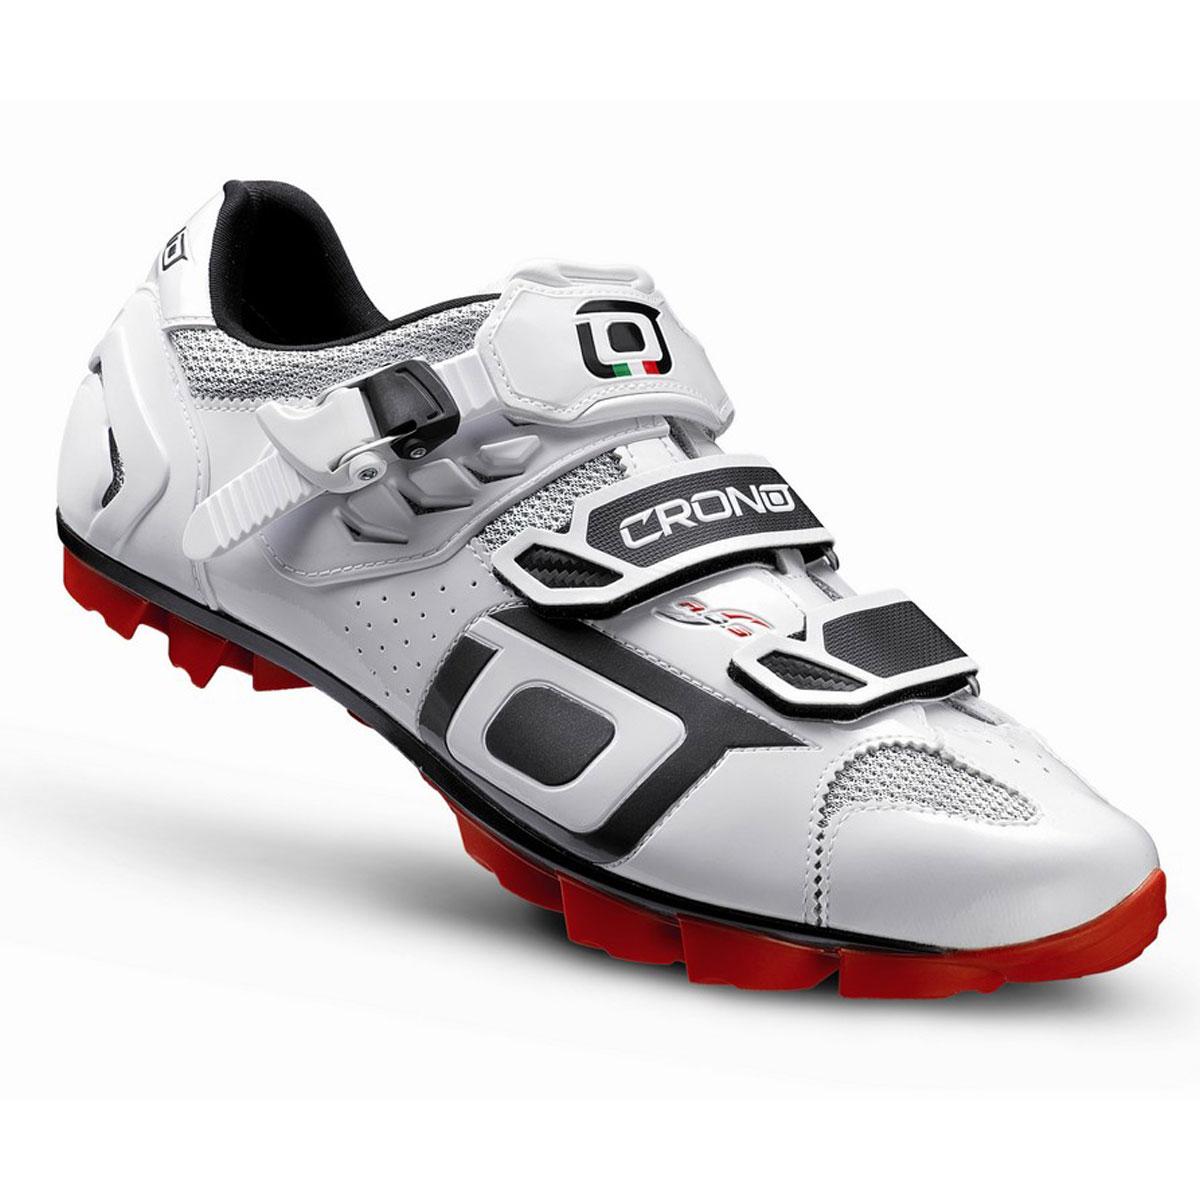 Boty Crono MTB Track white, 48